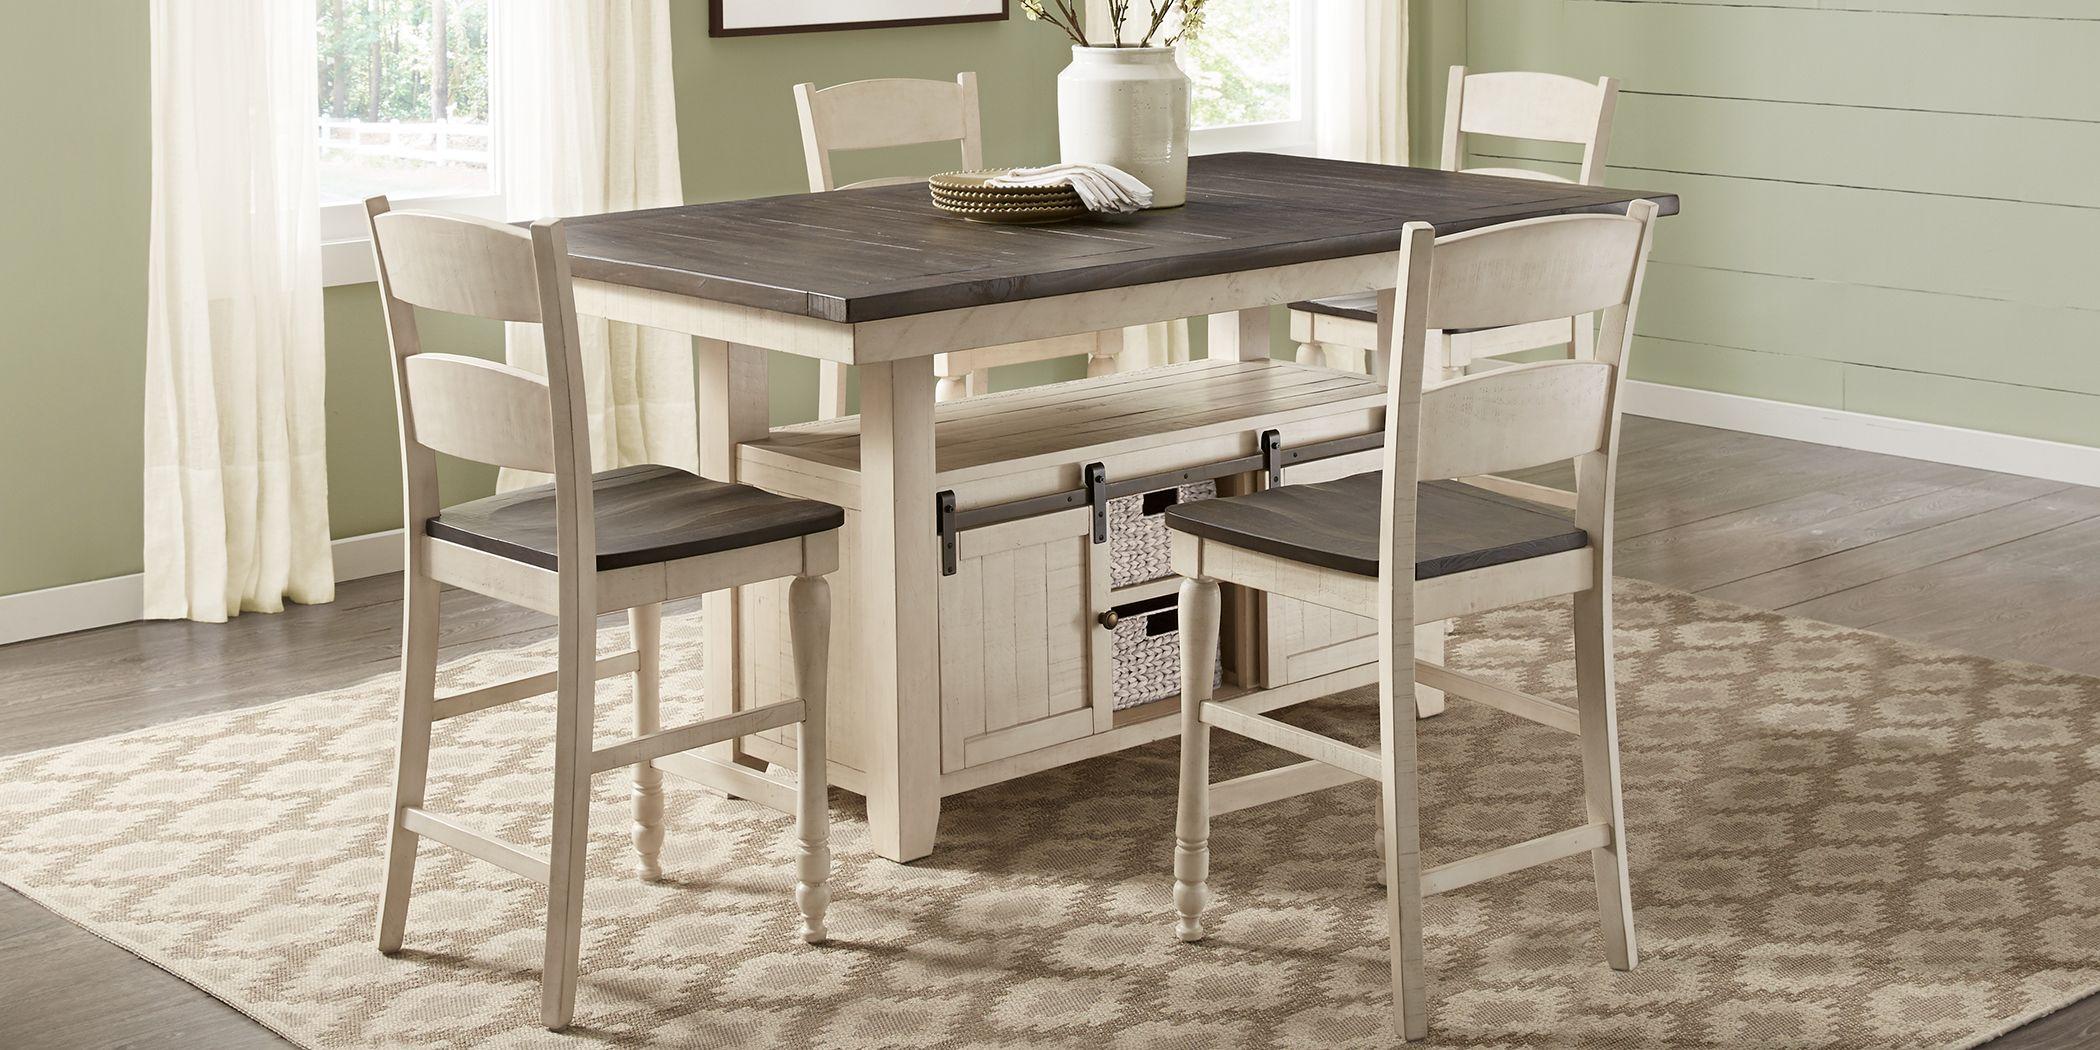 Kenbridge White 5 Pc Counter Height Dining Room